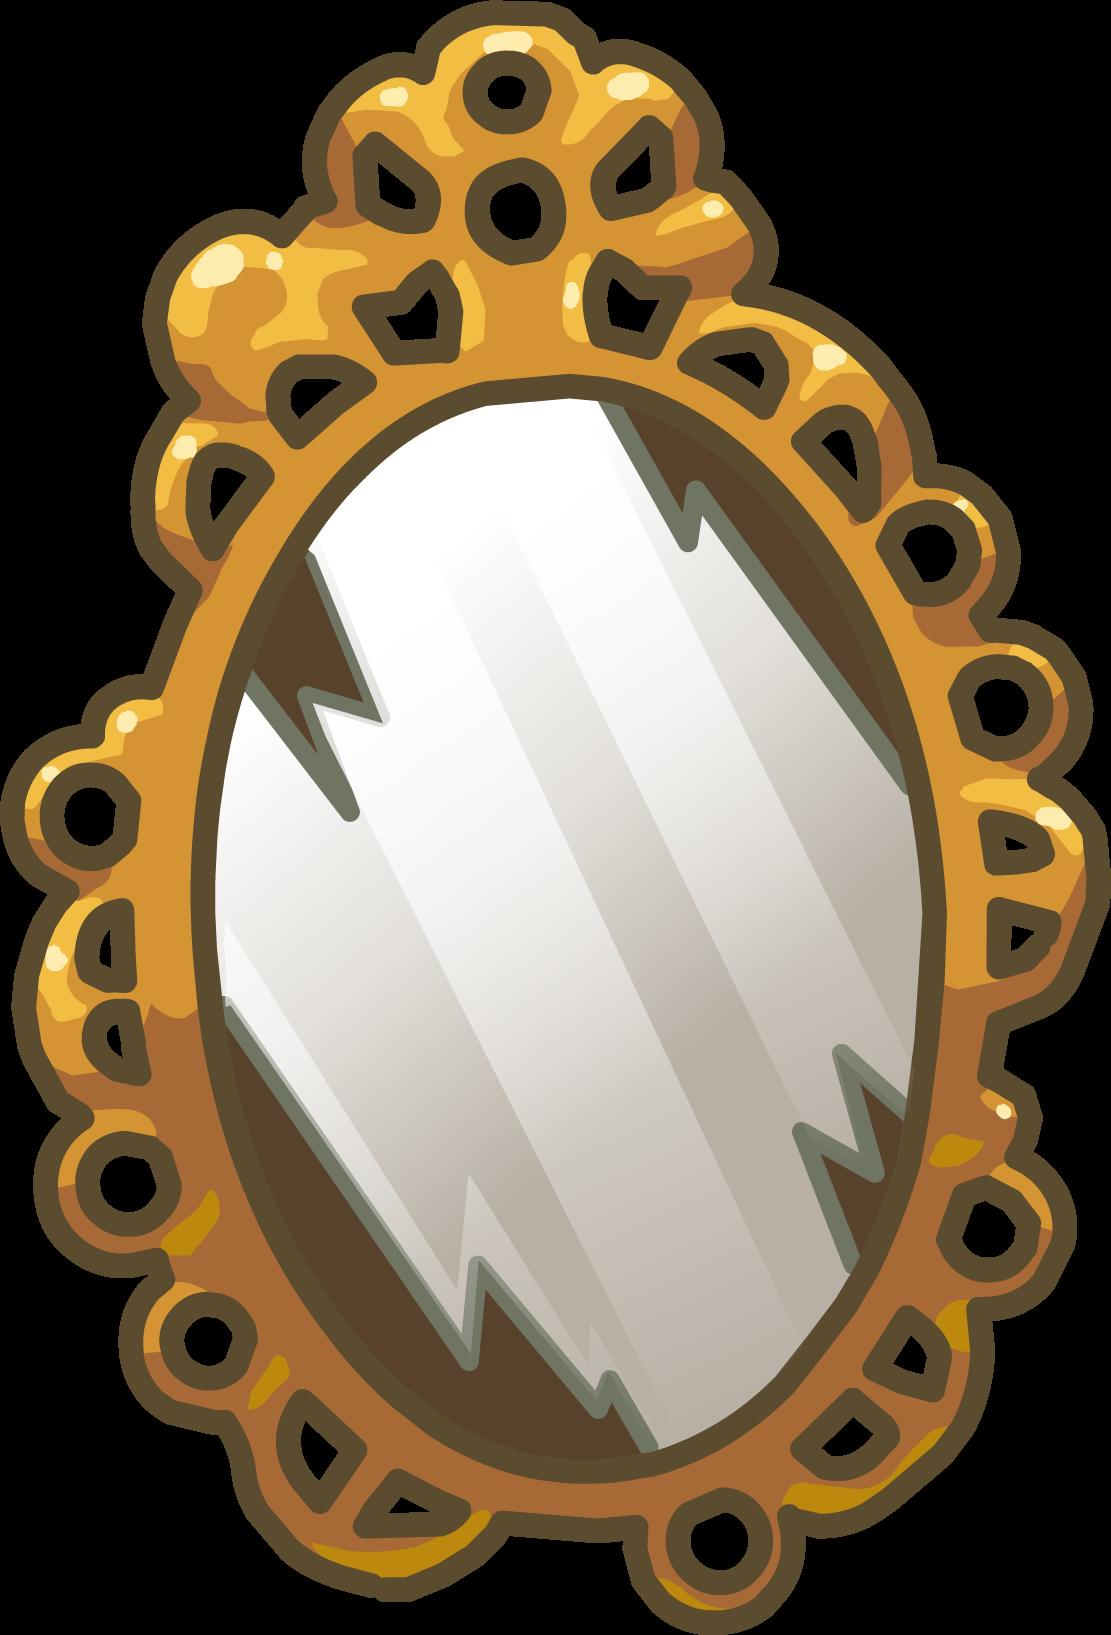 Espejo de Mano Mágico